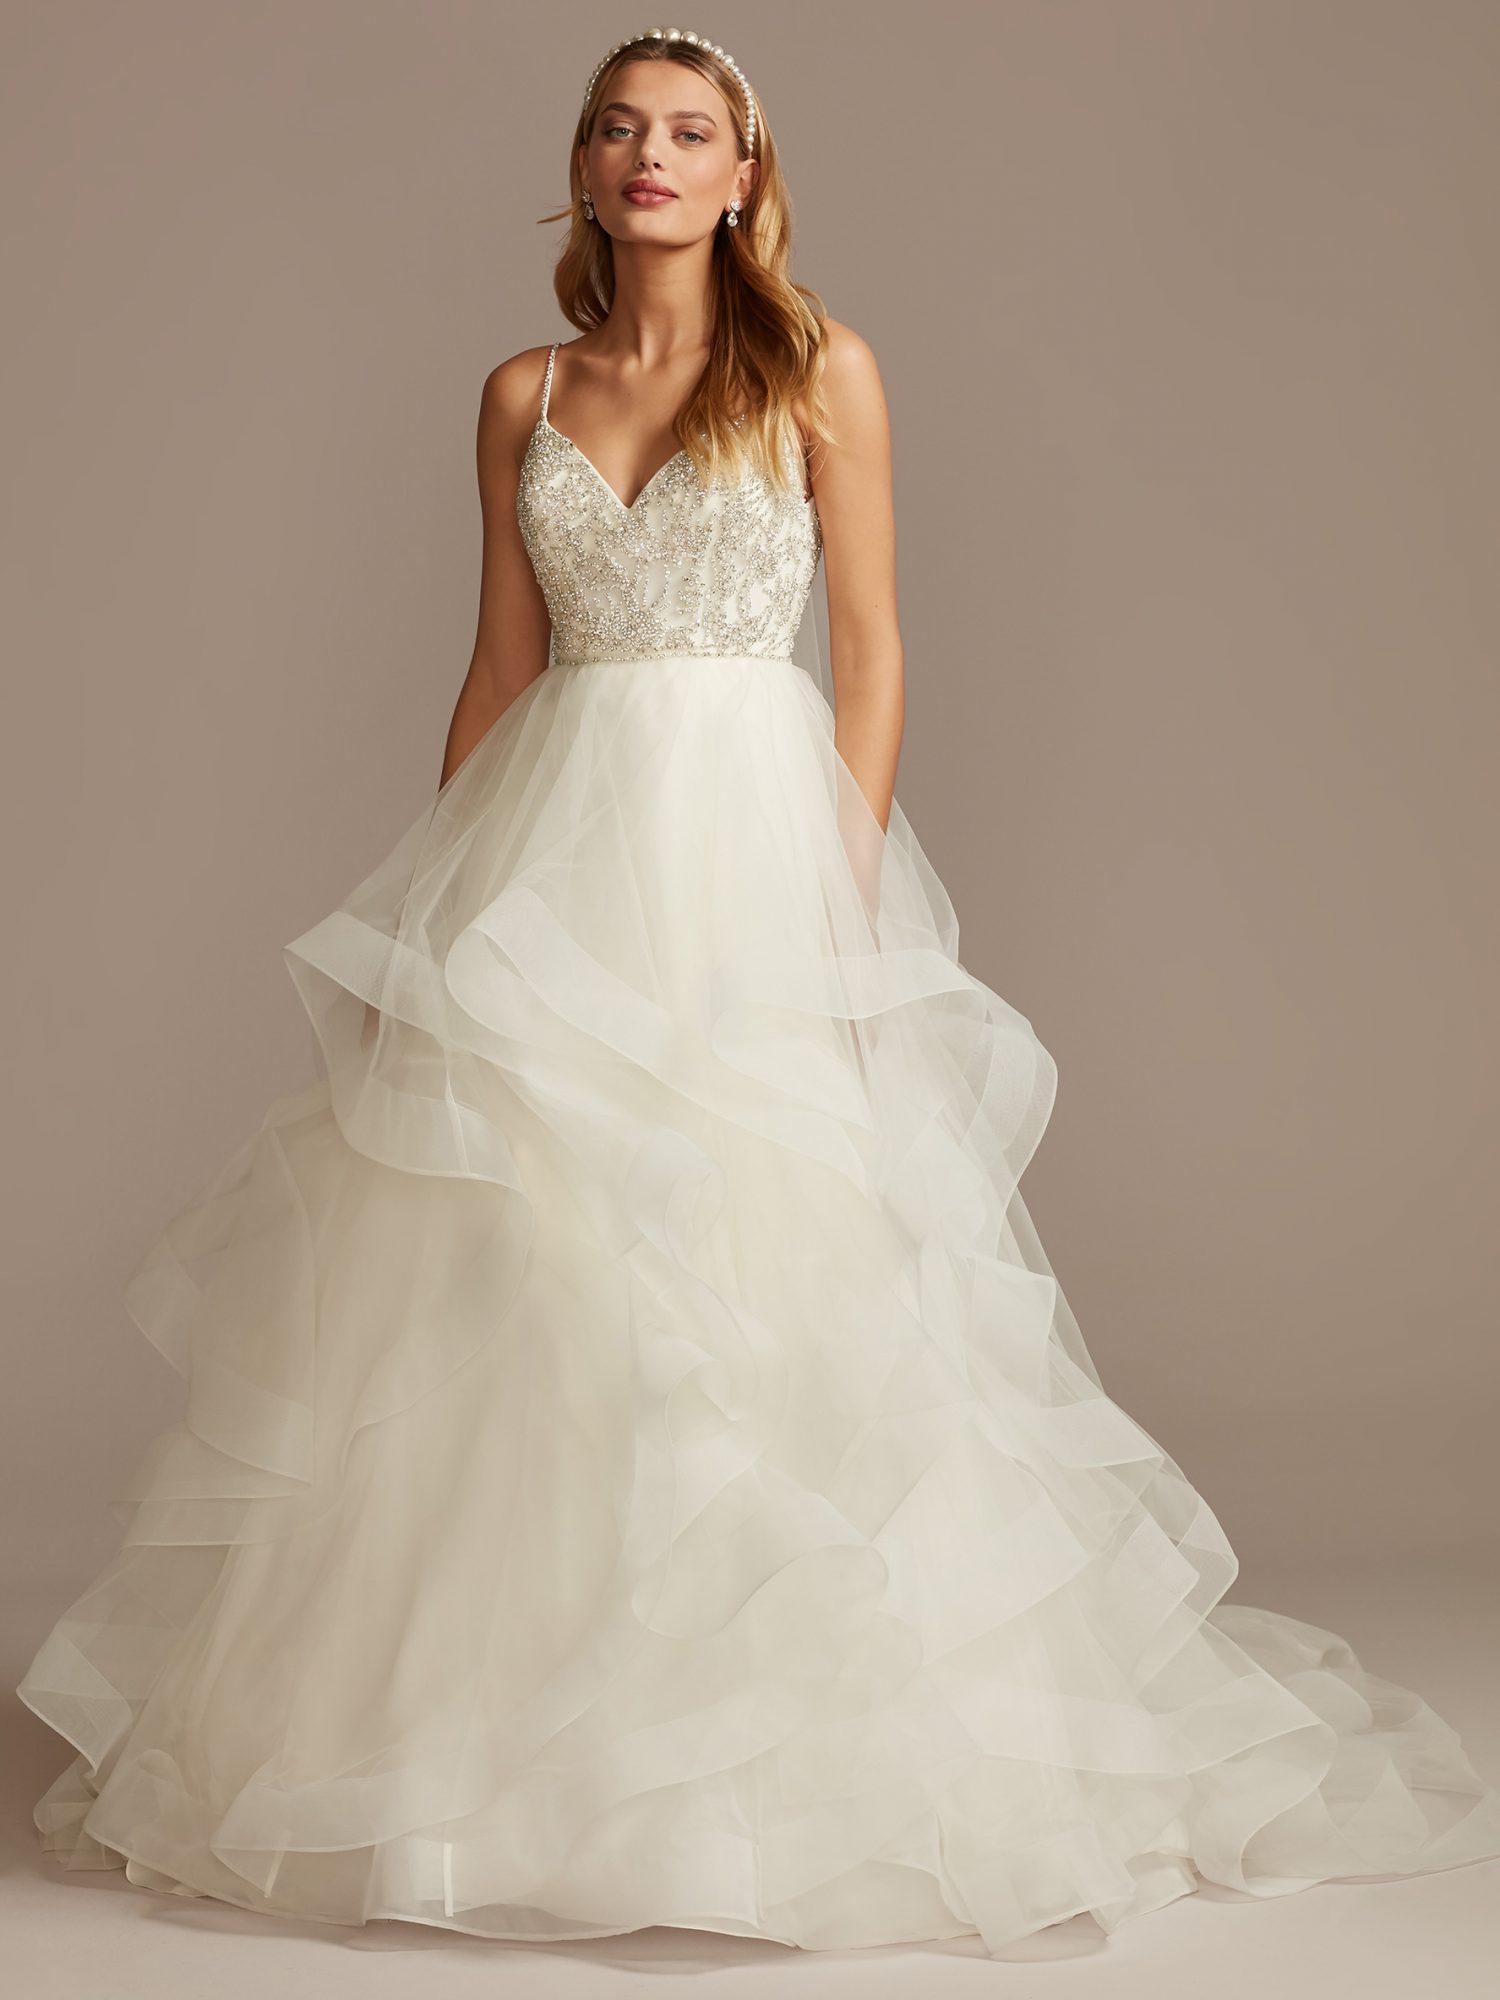 davids bridal layered tulle skirt a-line wedding dress spring 2021